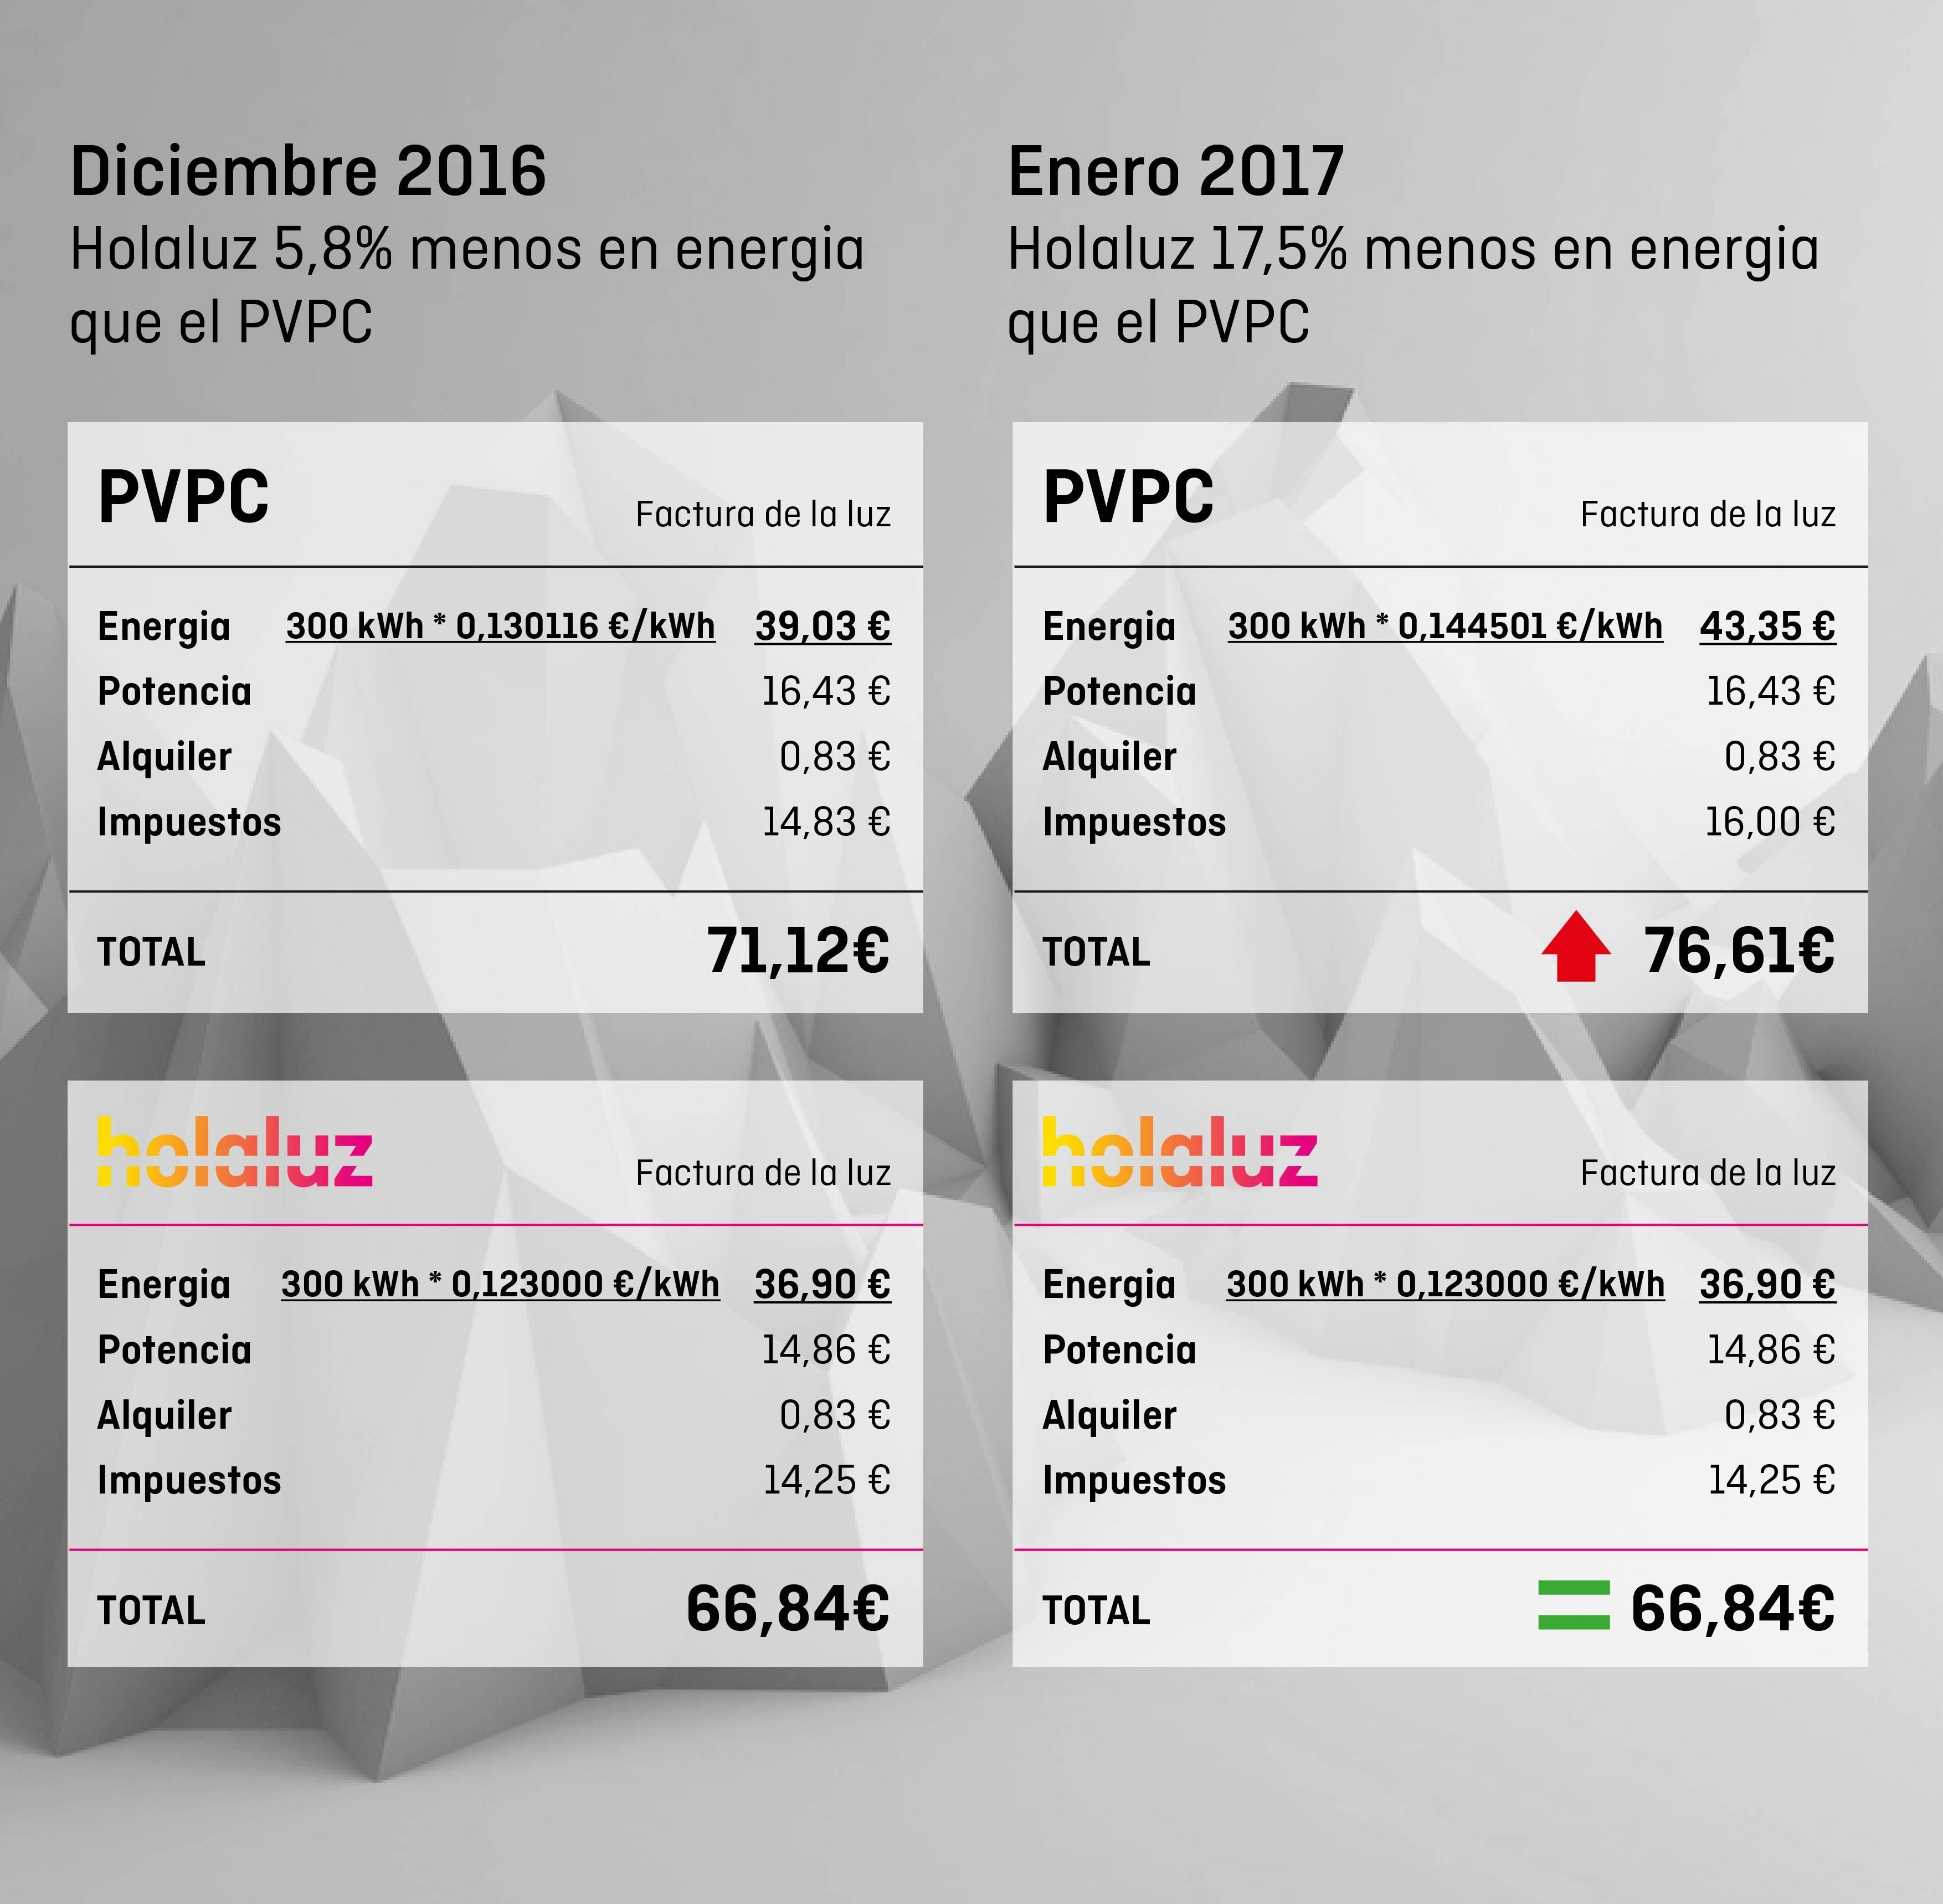 Holaluz vs PVPC